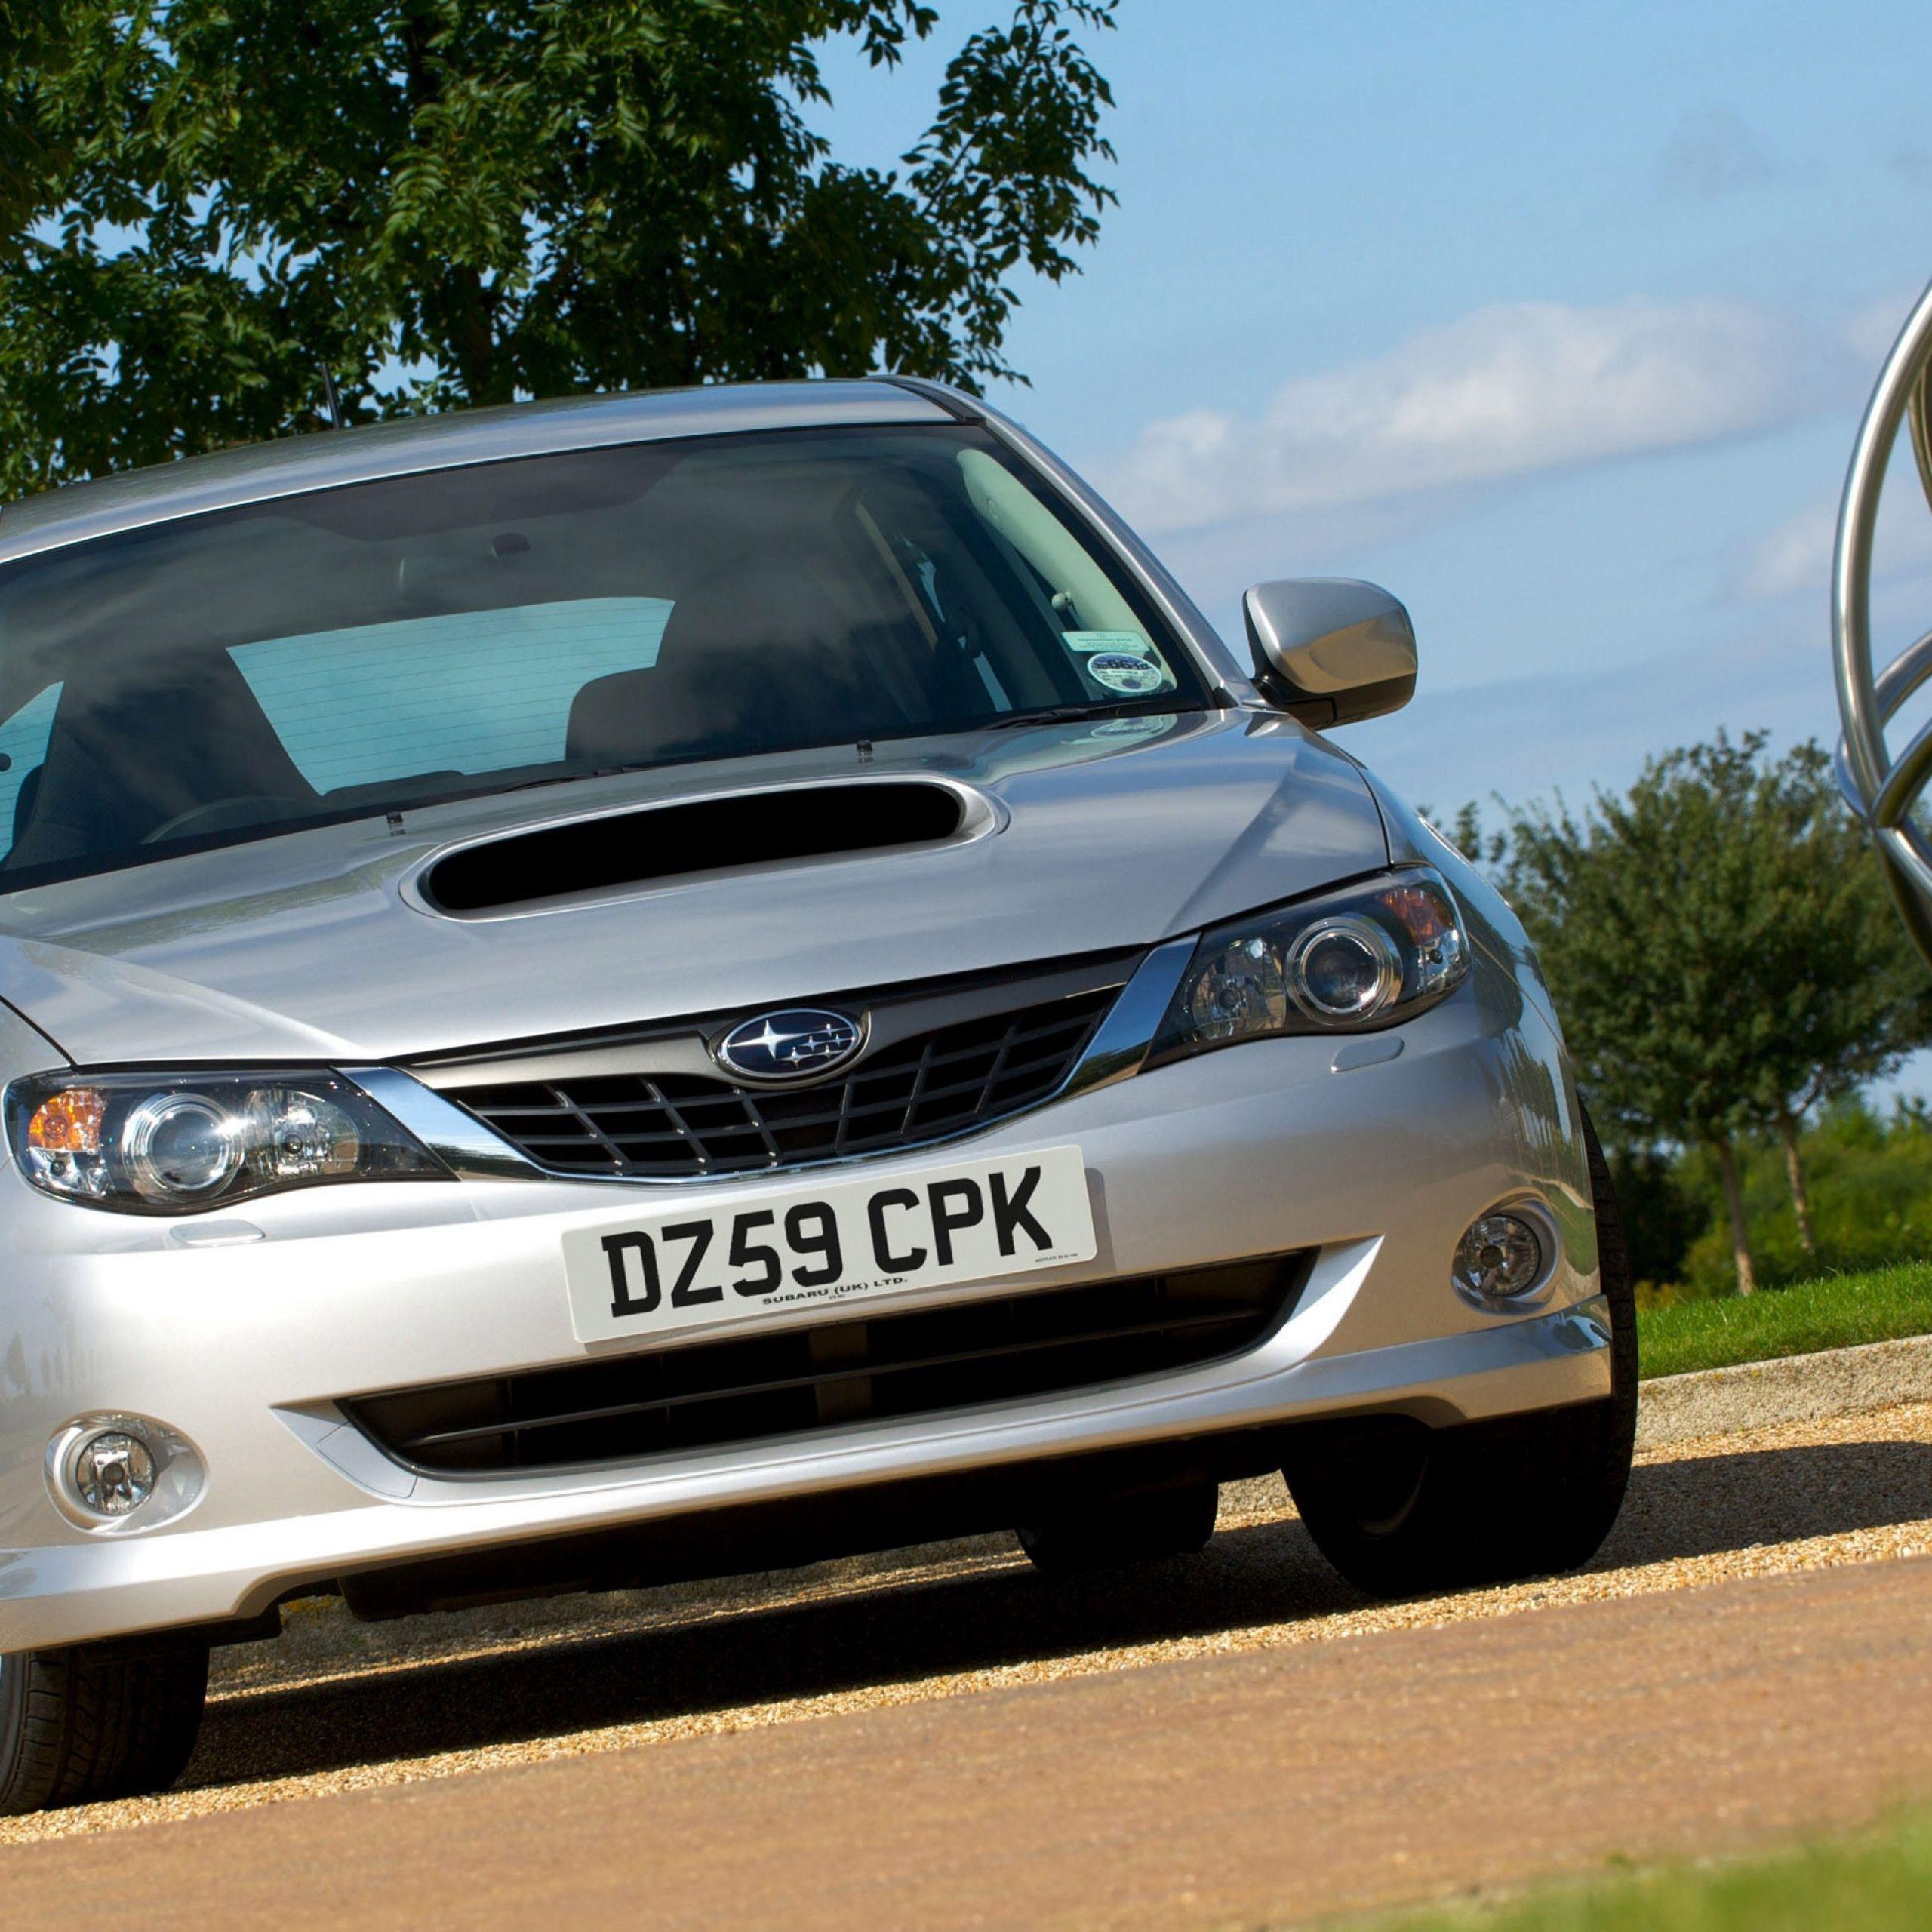 Wrx Hatchback Best Of Index Of Img Subaru Impreza 2 0d Rc